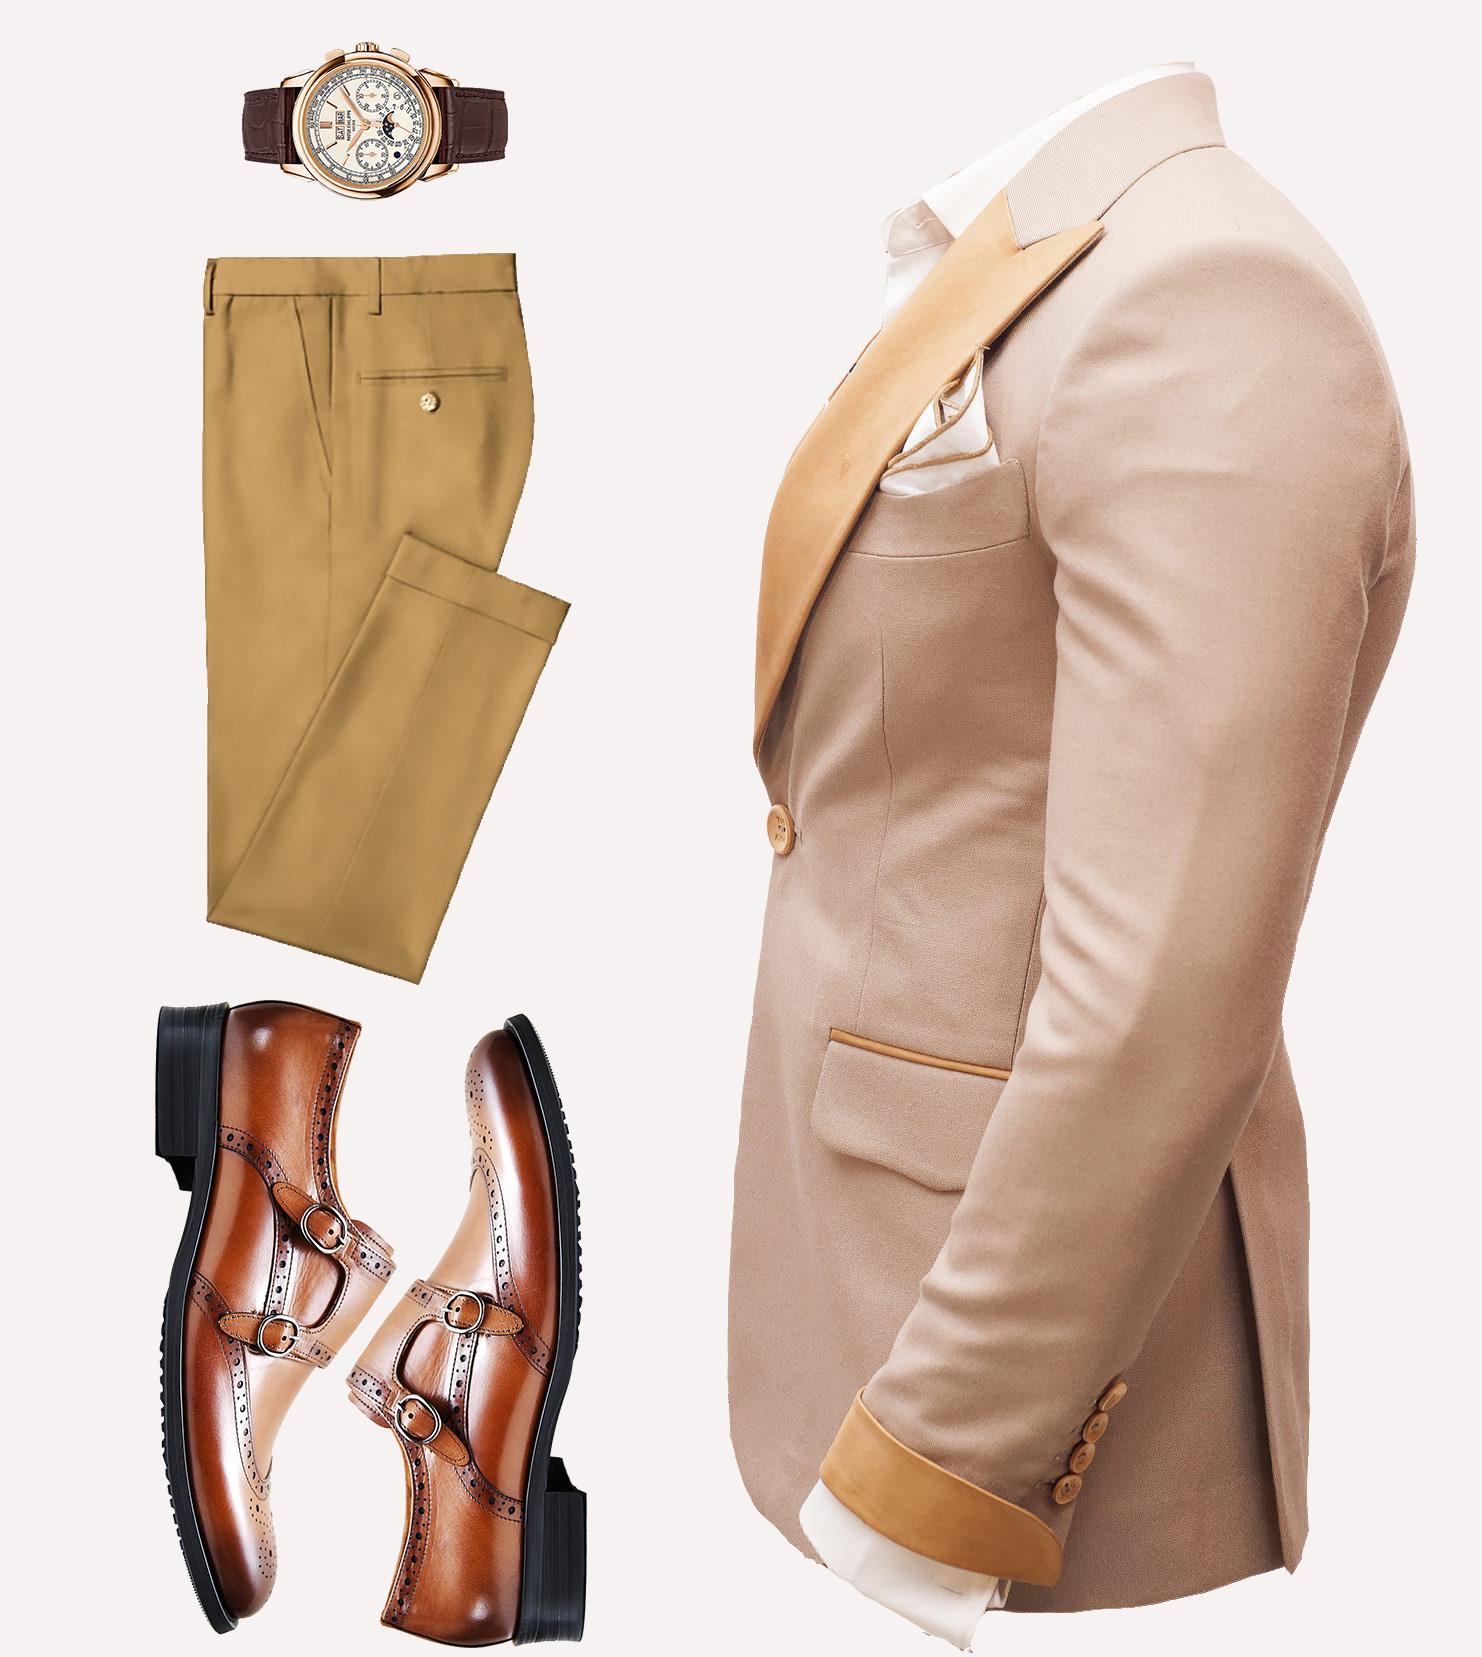 men's luxury shoes nairobi kenya